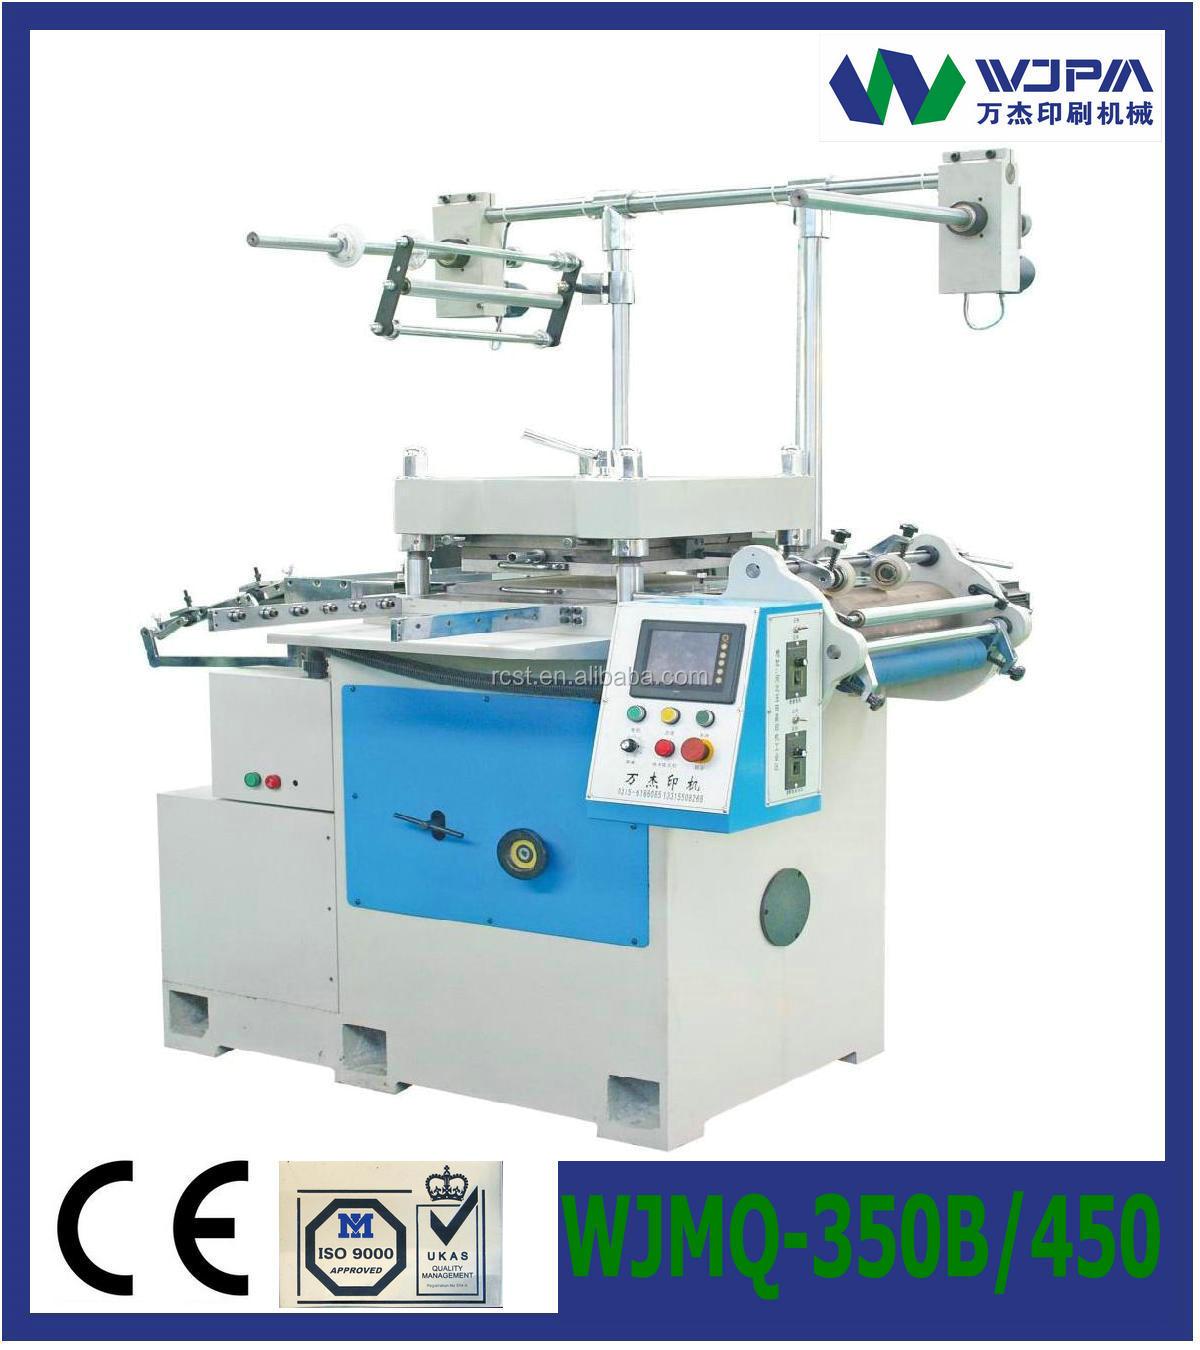 WJMQ450 CNC High Speed Die-cutting Machine